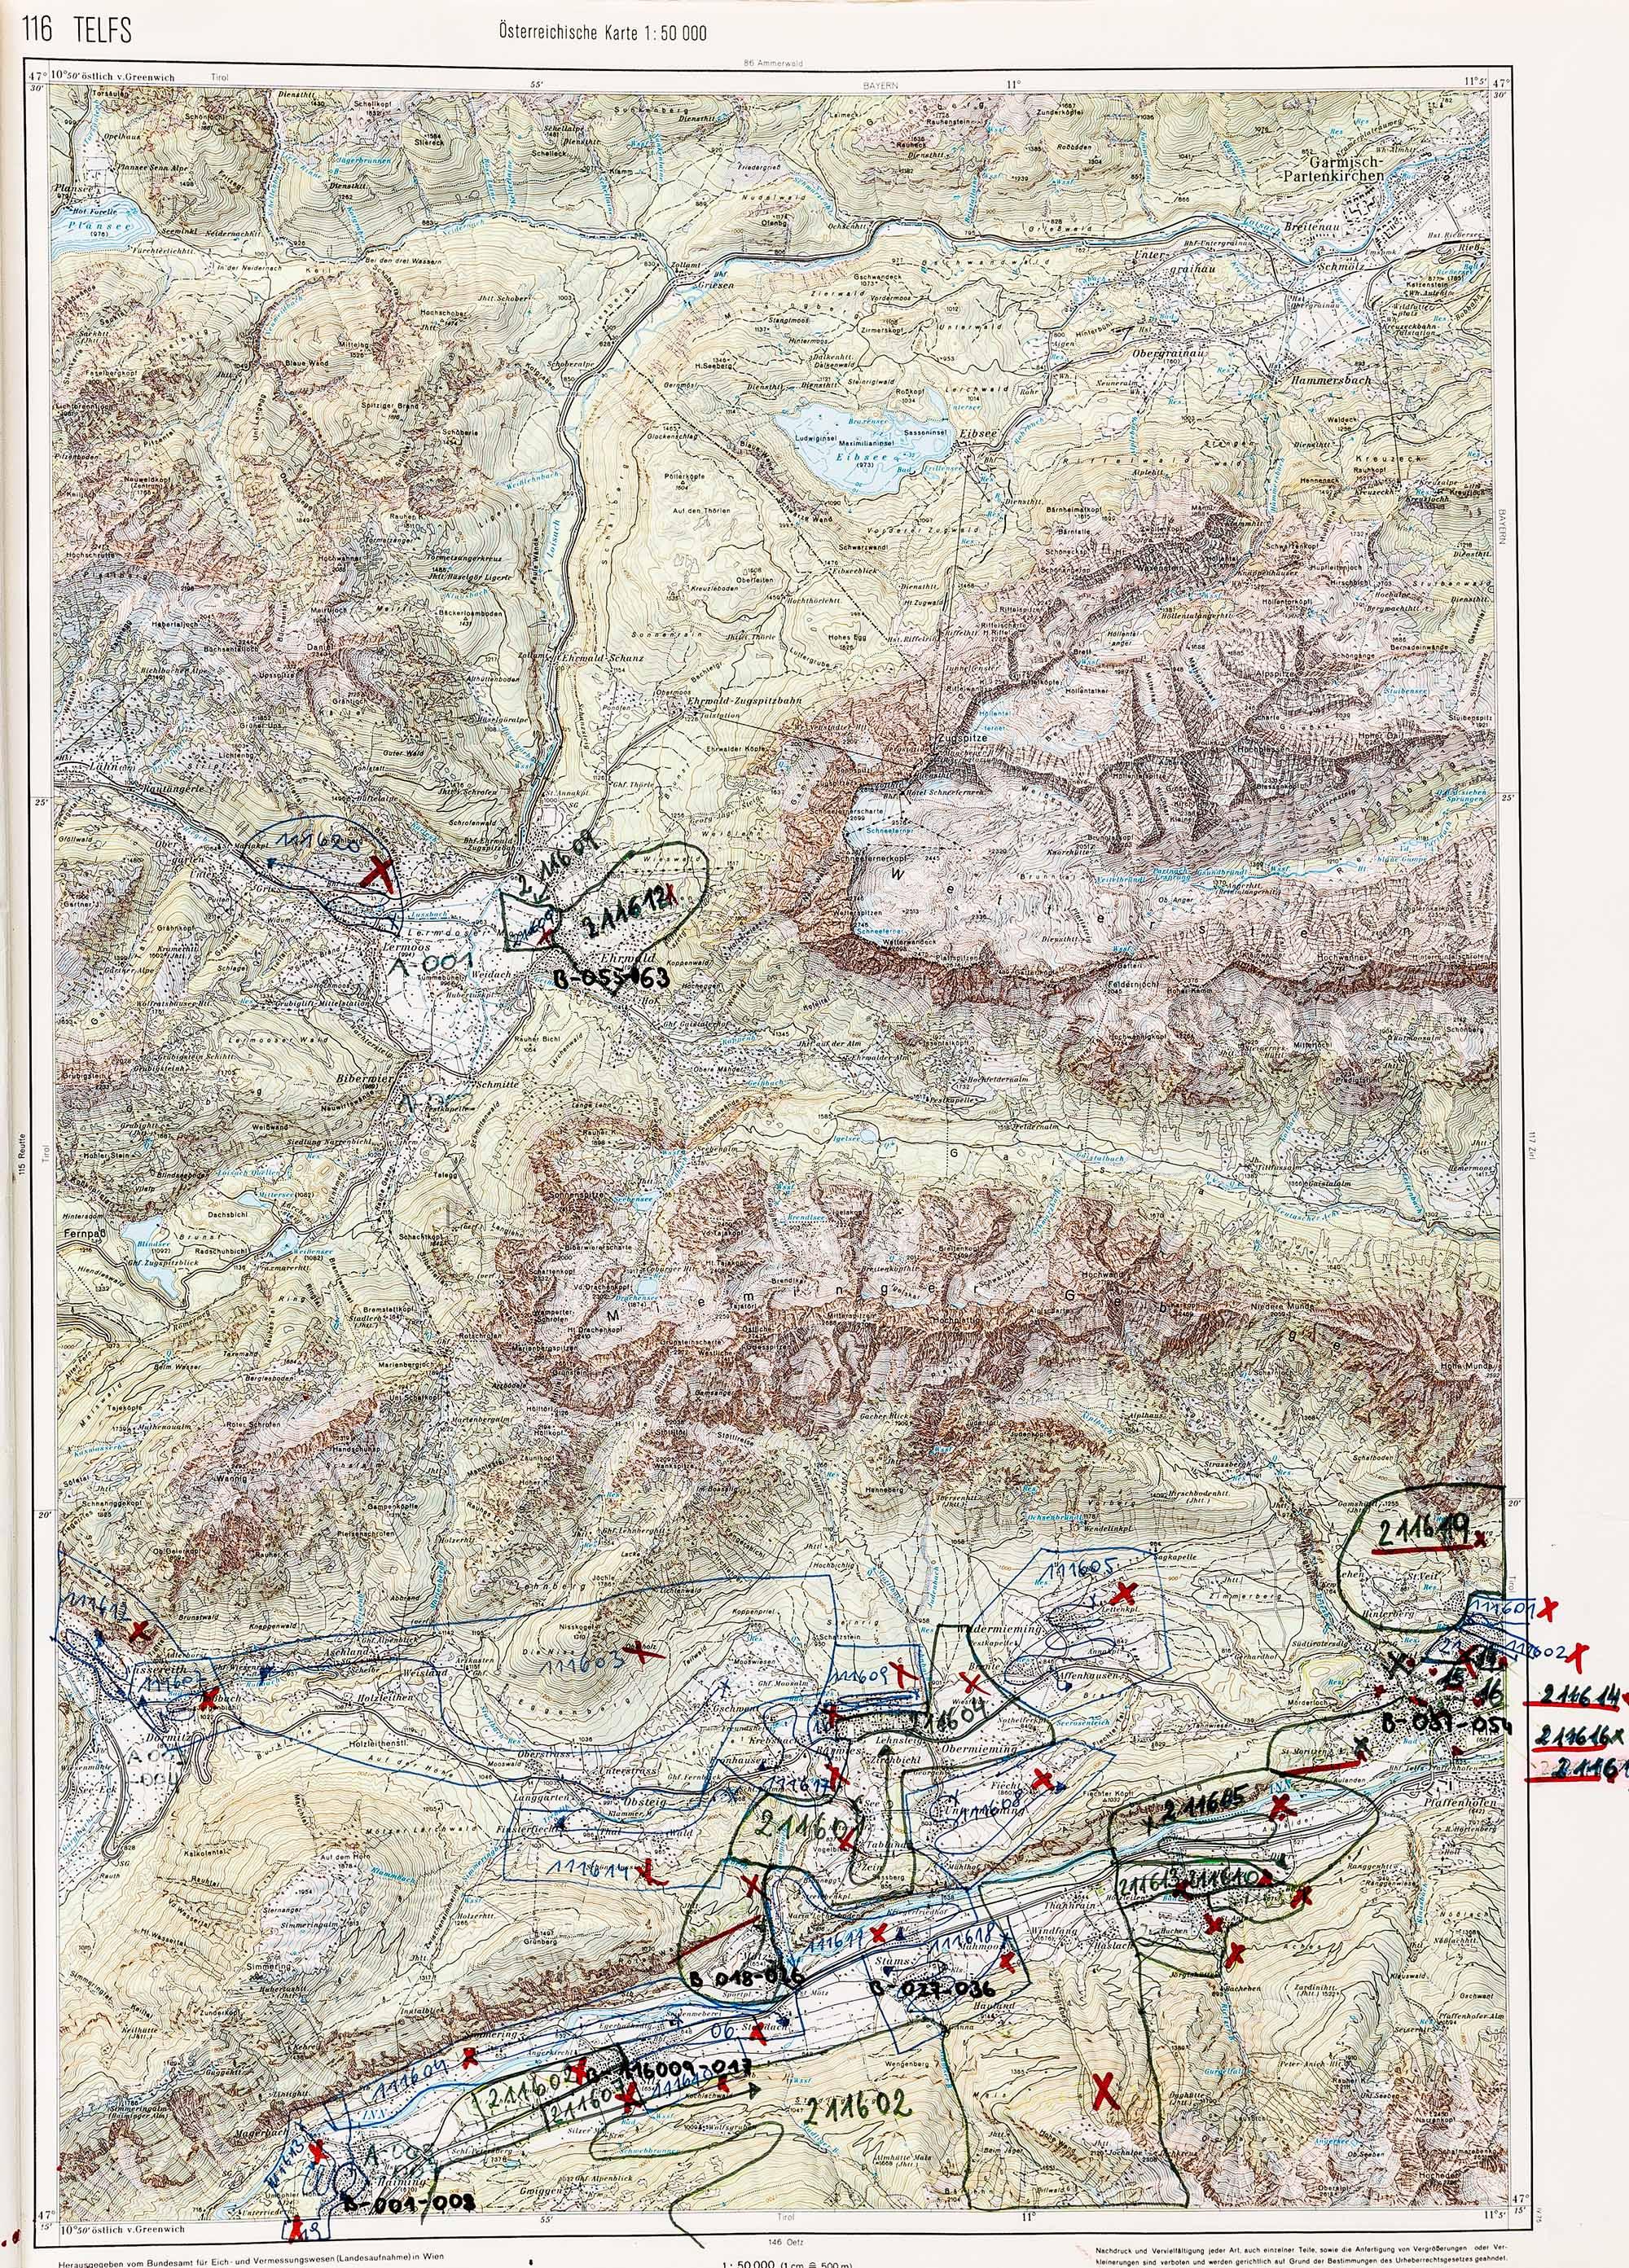 1979-1982 Karte 116